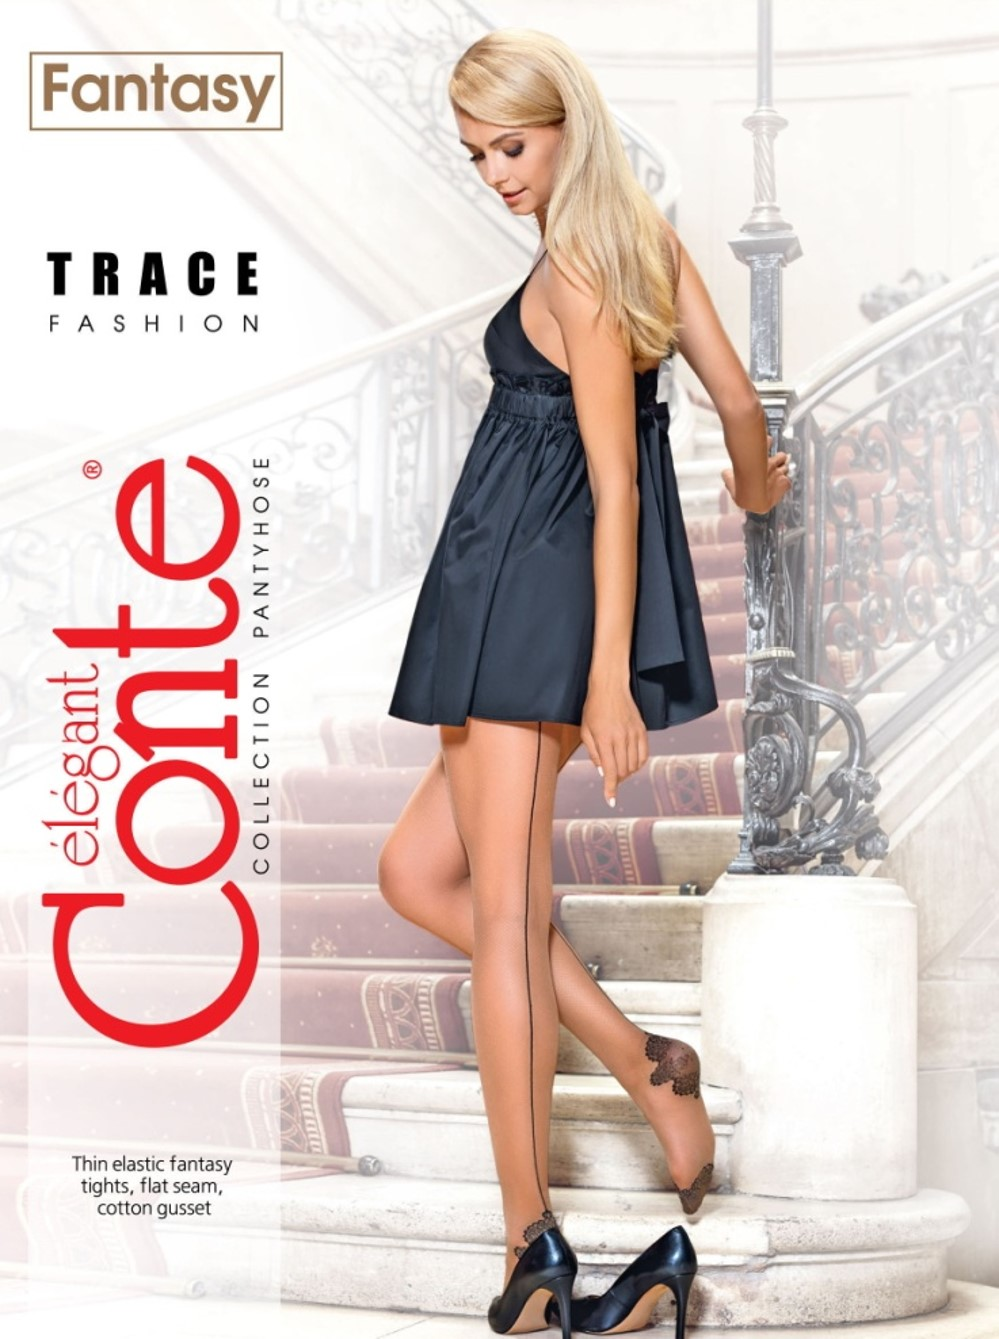 trace.jpg